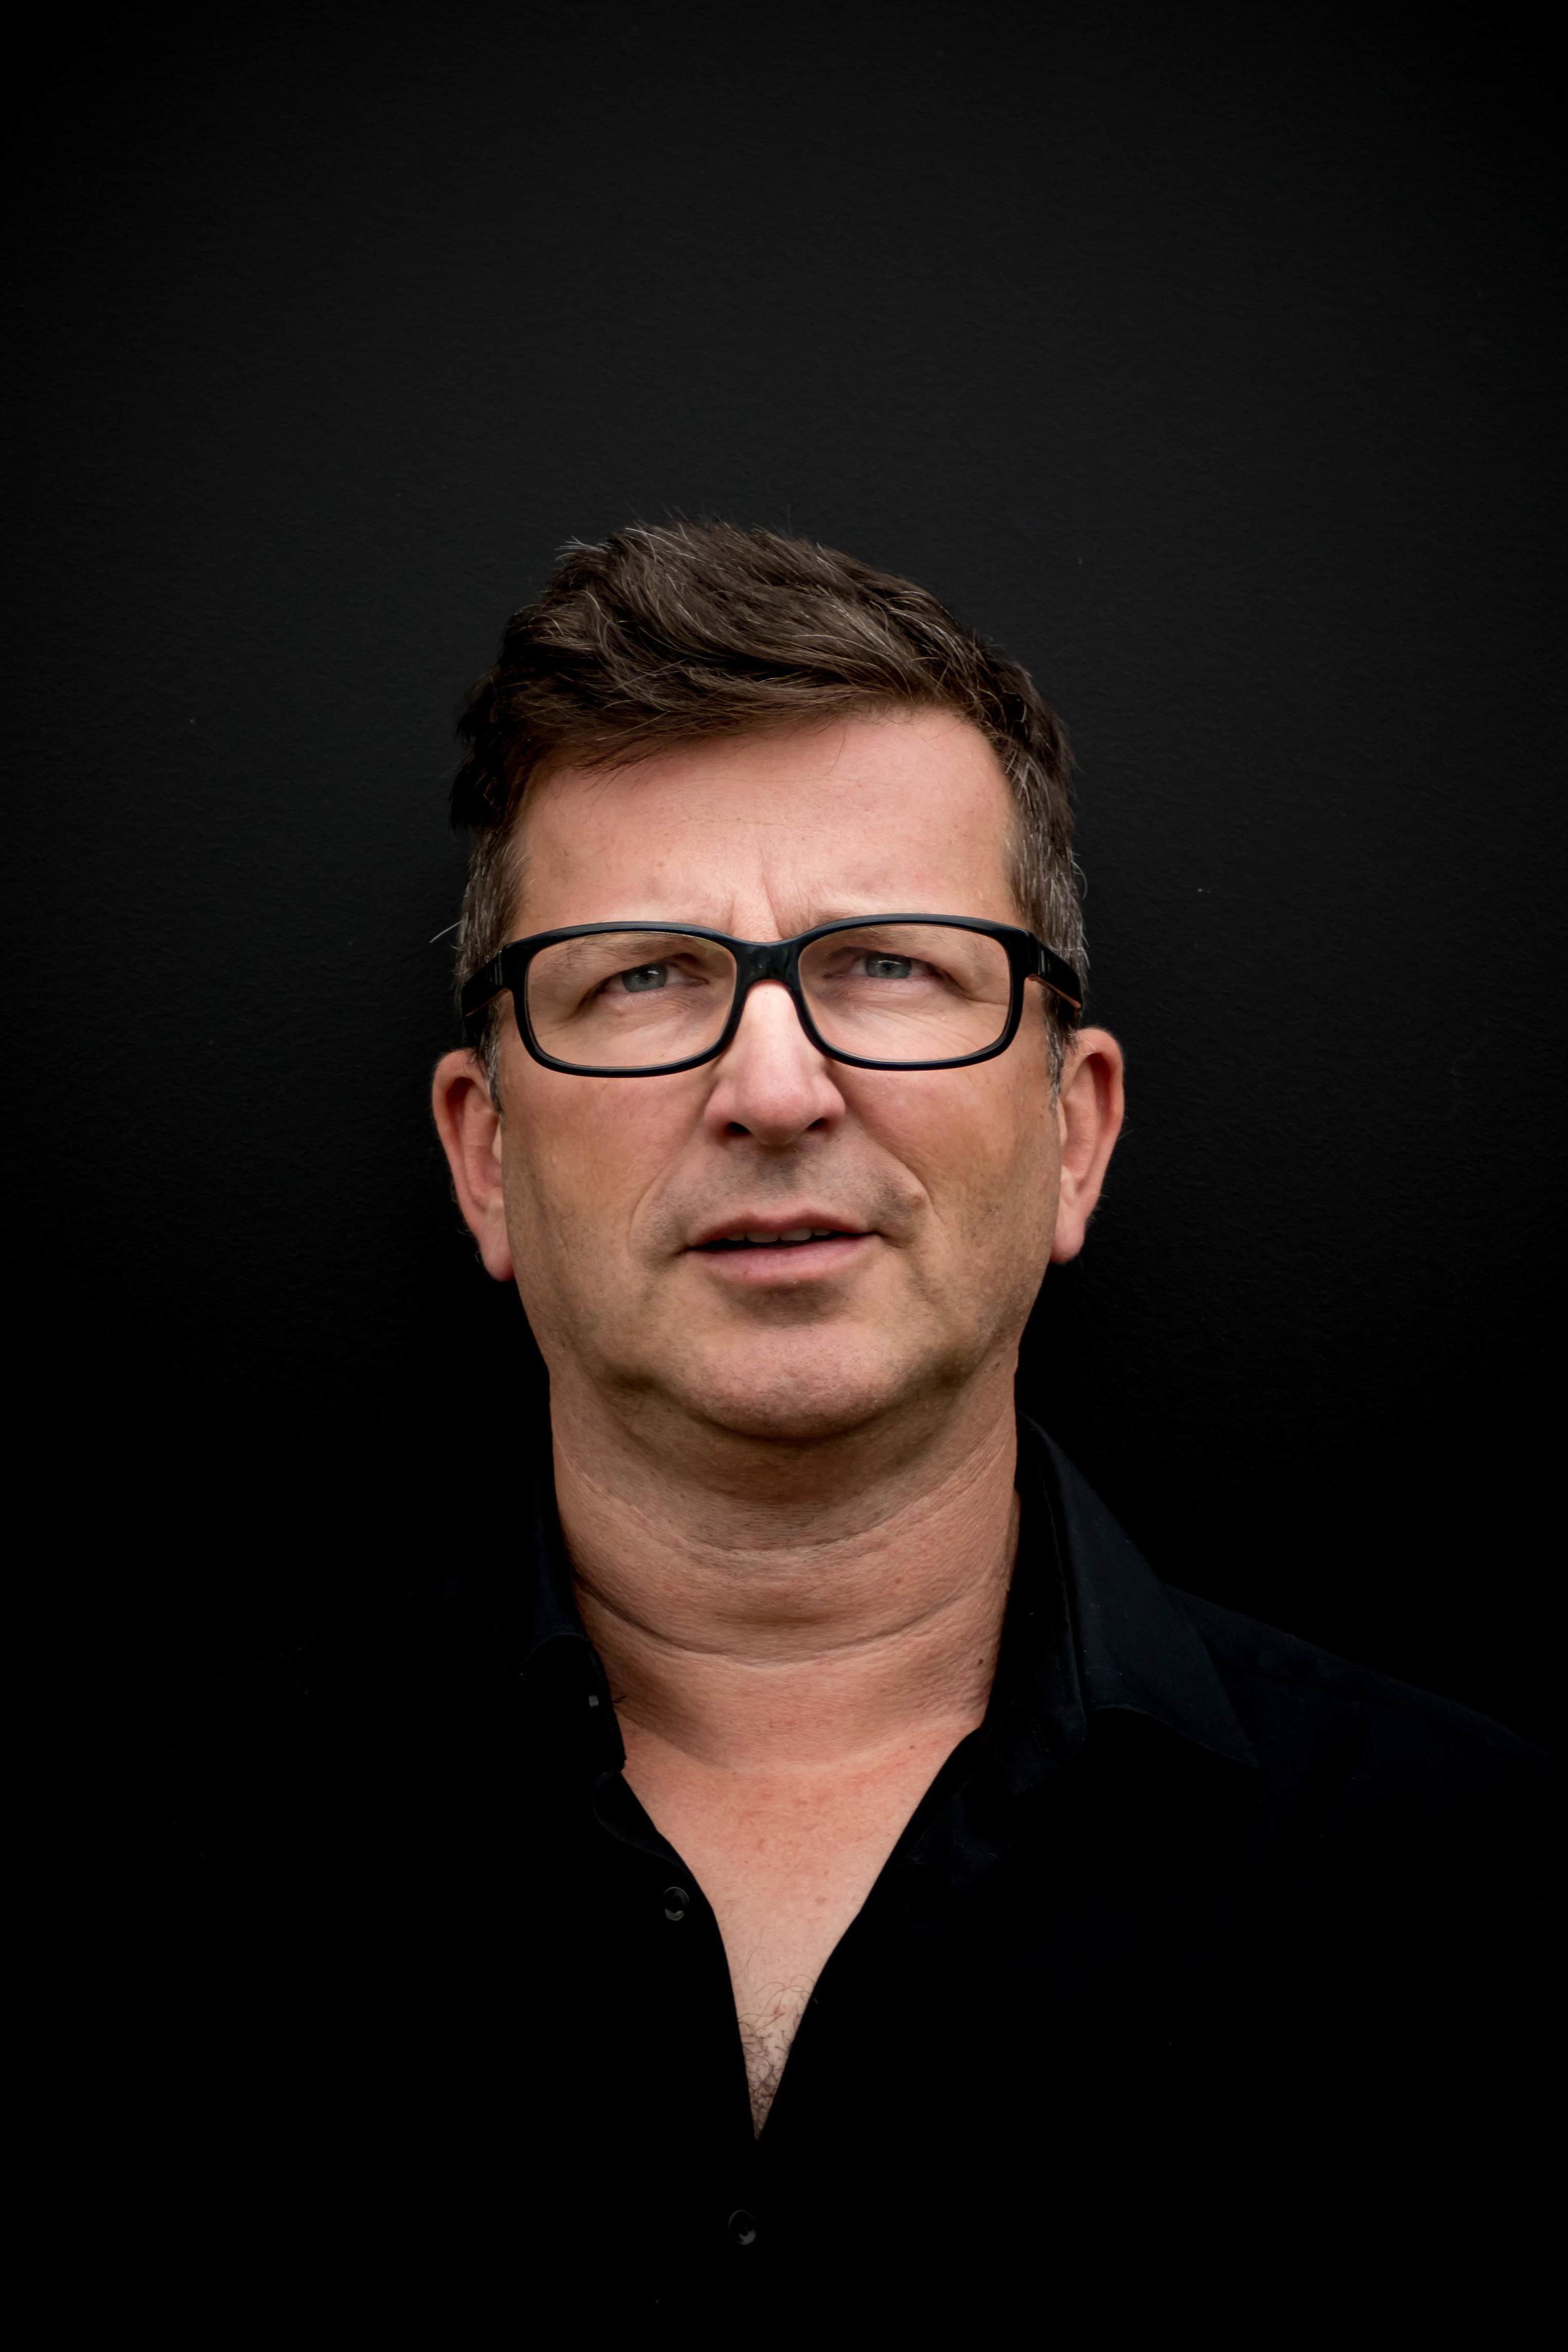 Jan Peeters - Architect - zaakvoerderJan startte Axcis in 1998.jan.peeters@axcis.be